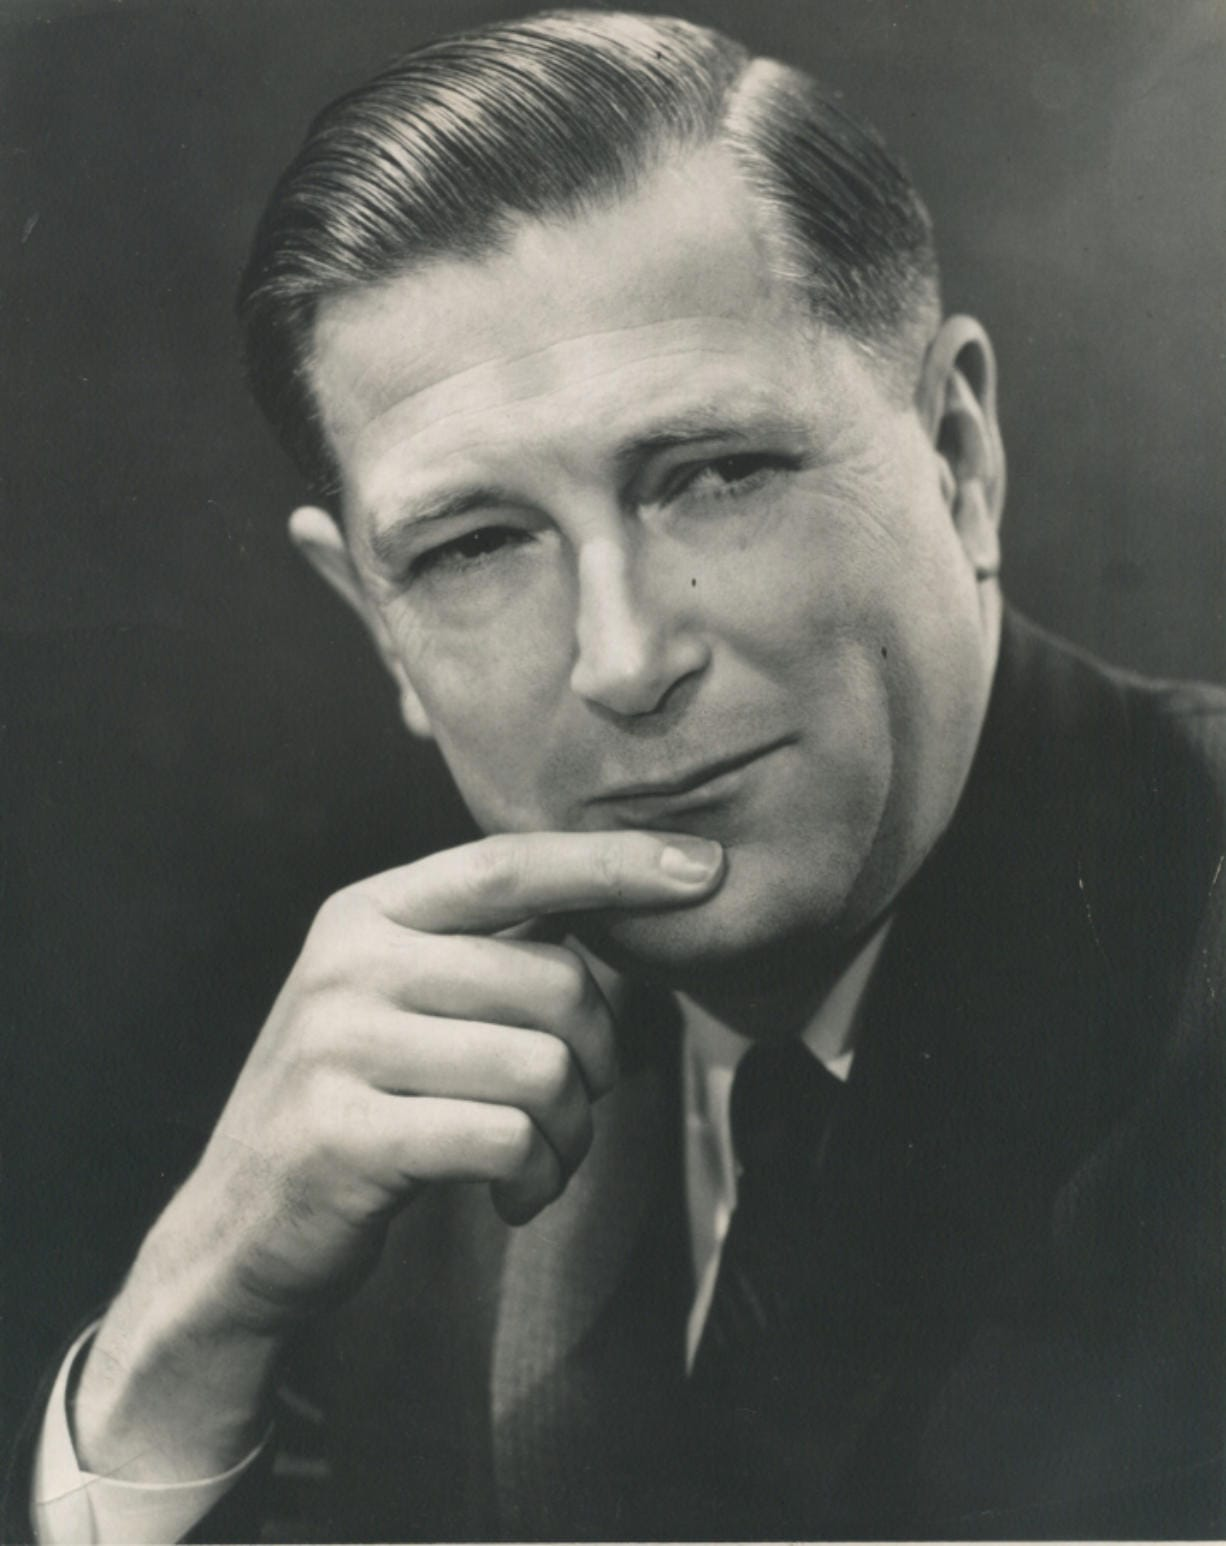 Jack Murdock Founder of the M.J. Murdock Charitable Trust